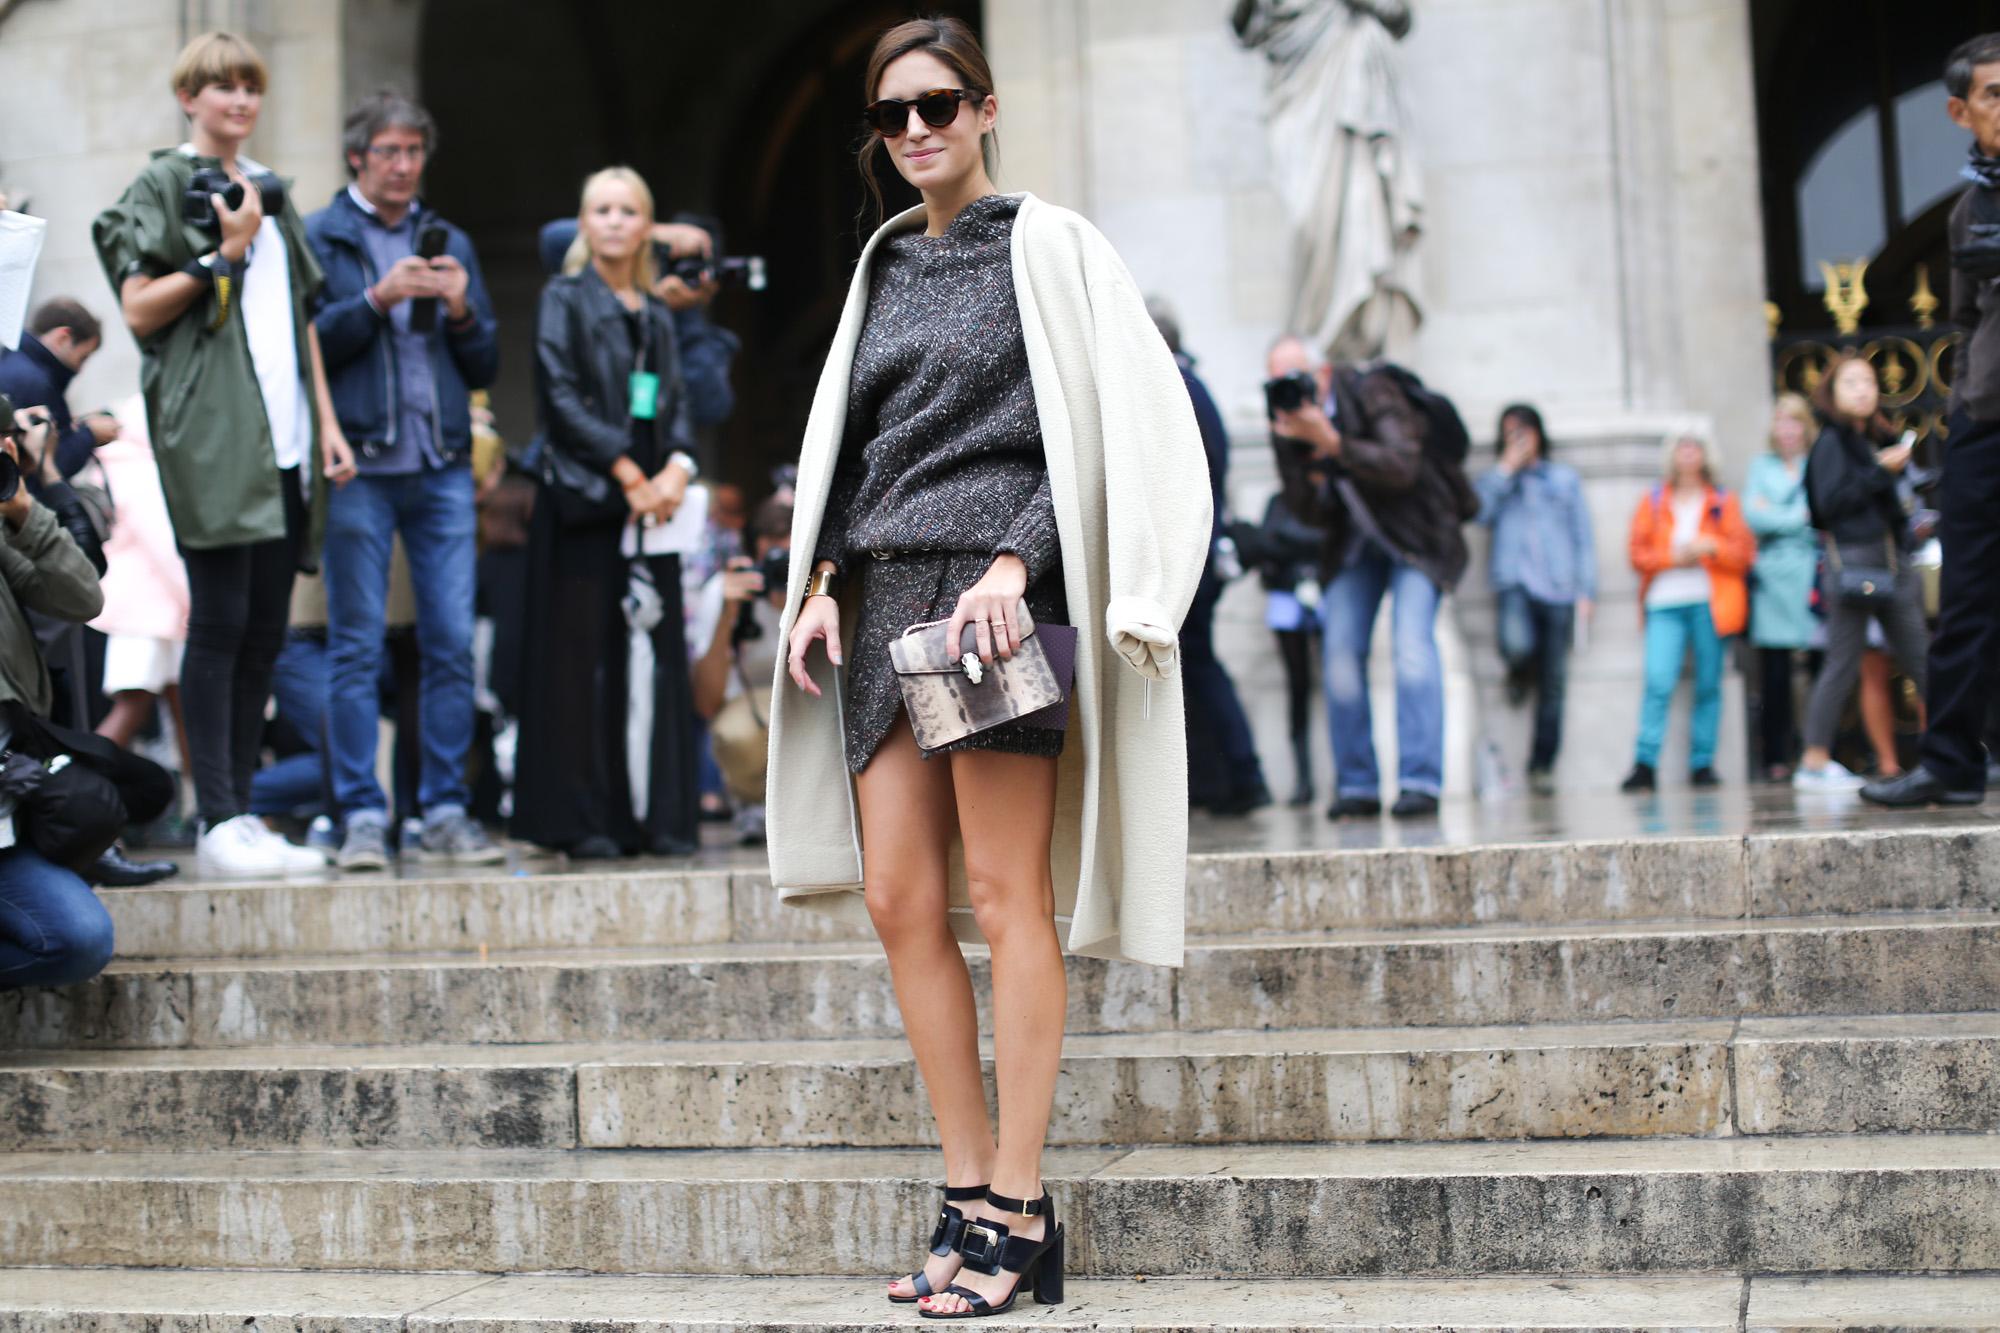 Clochet-streetstyle-paris-fashion-week-gala-gonzalez-stella-mccartney-3